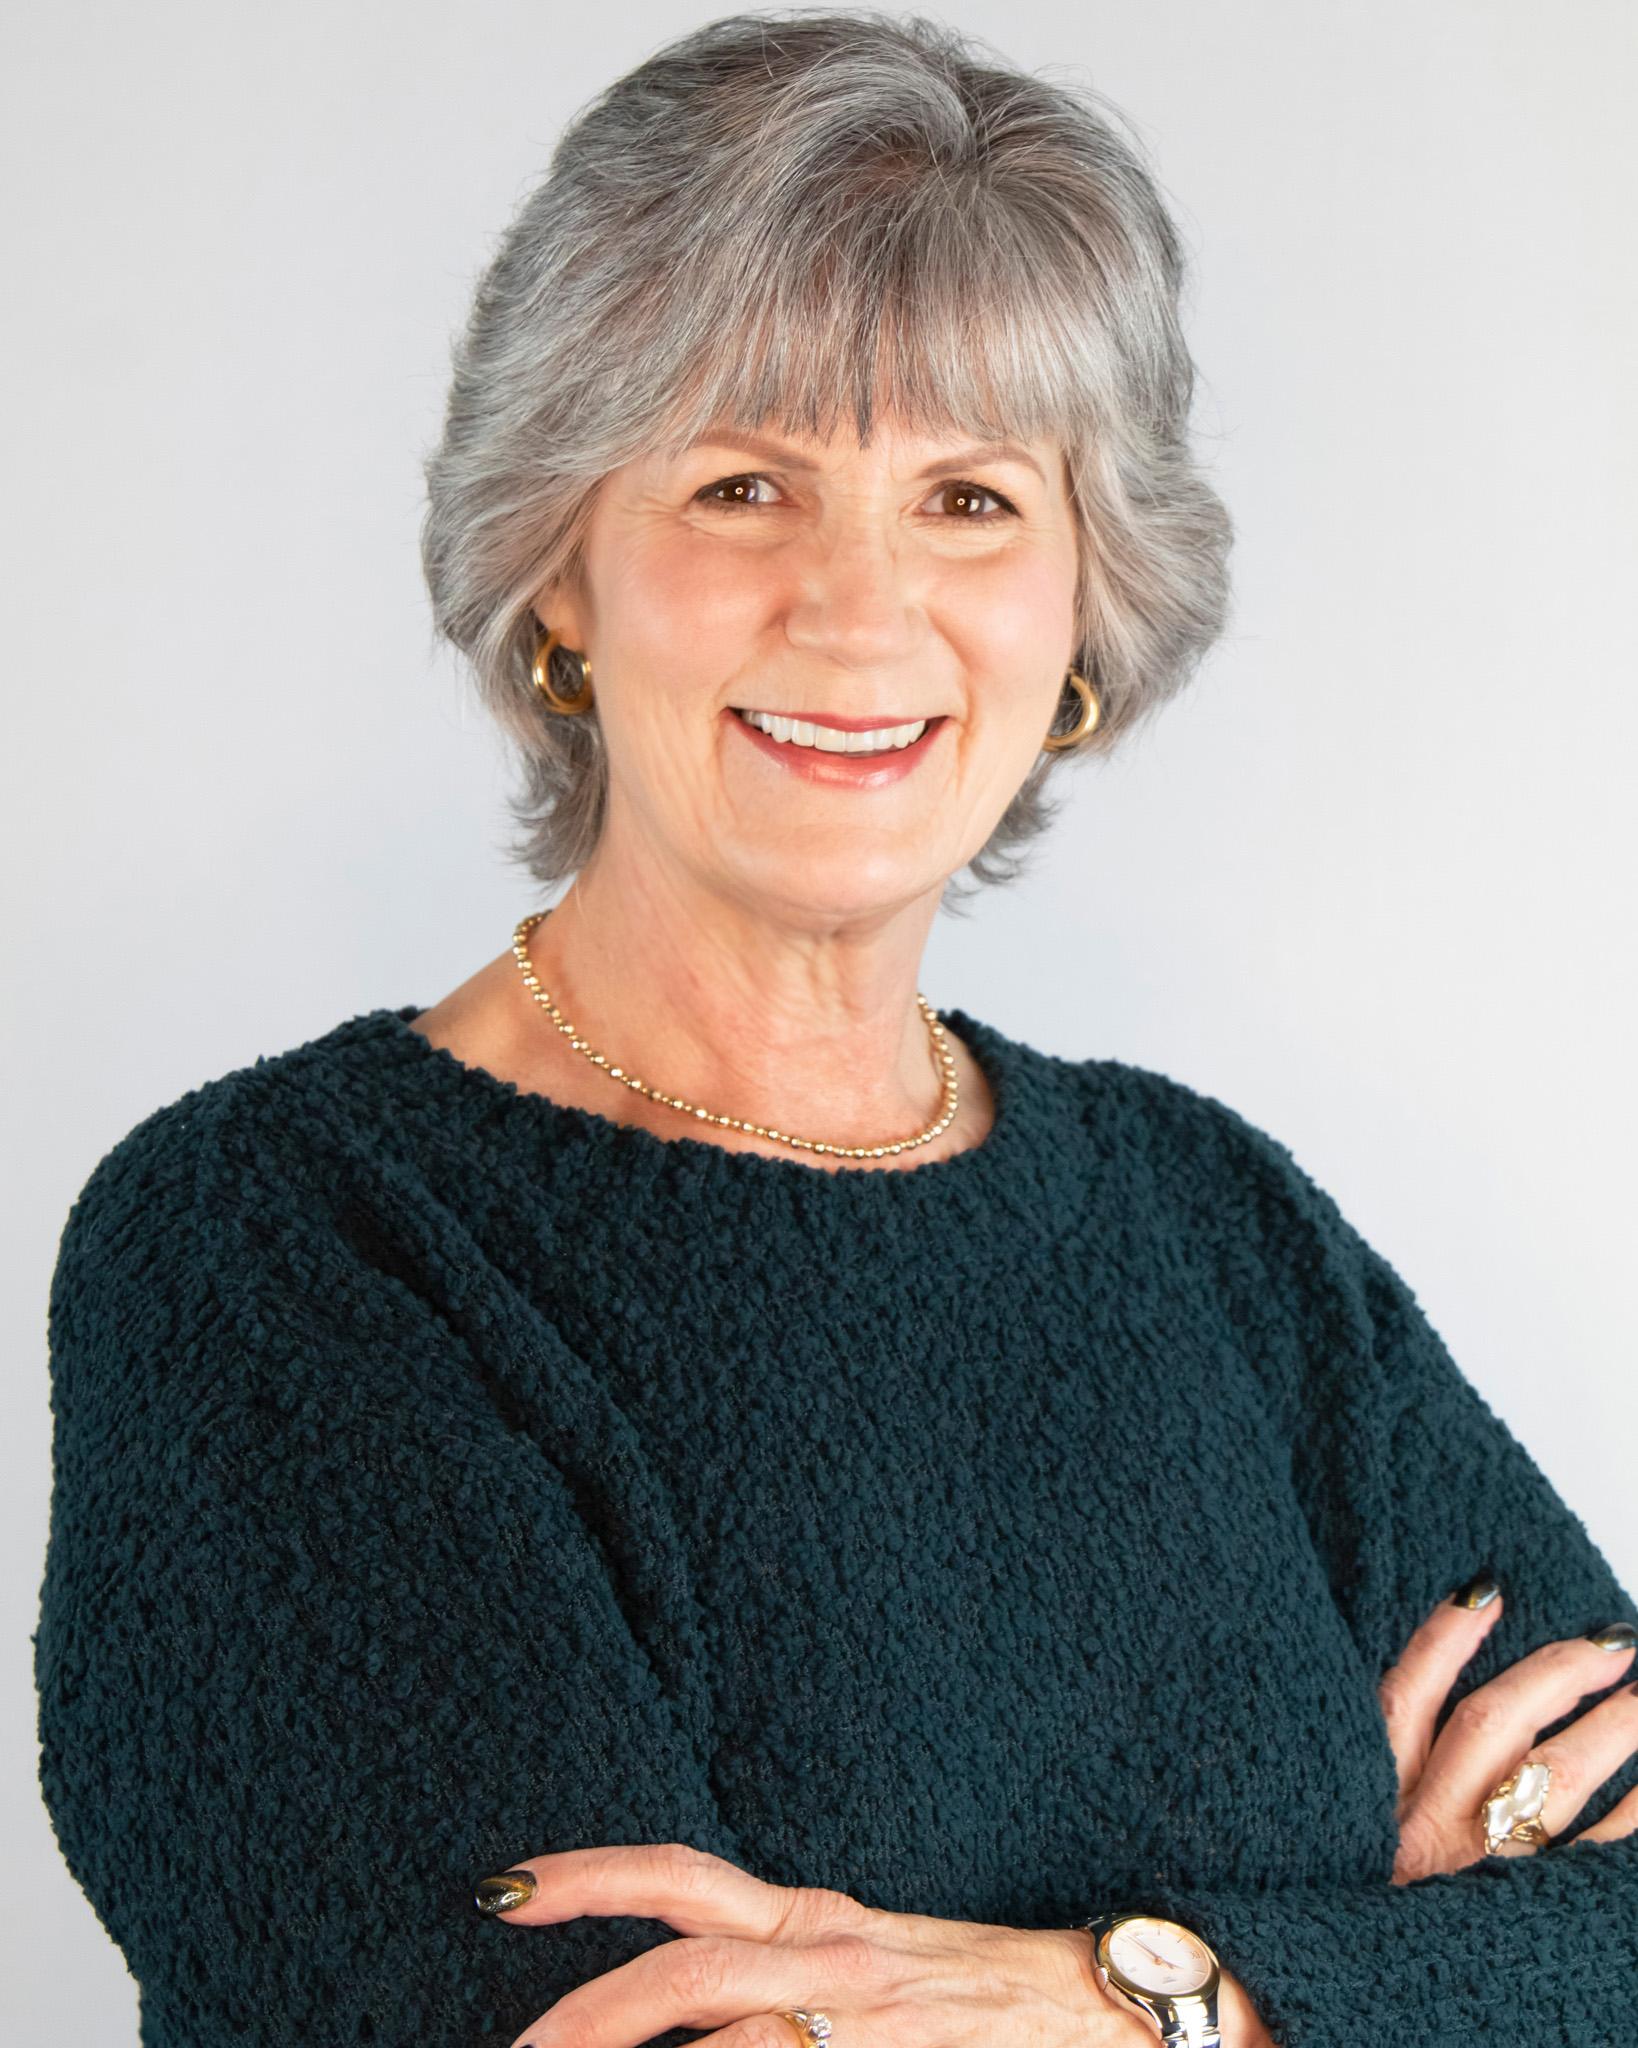 Kathy undefined Scribner